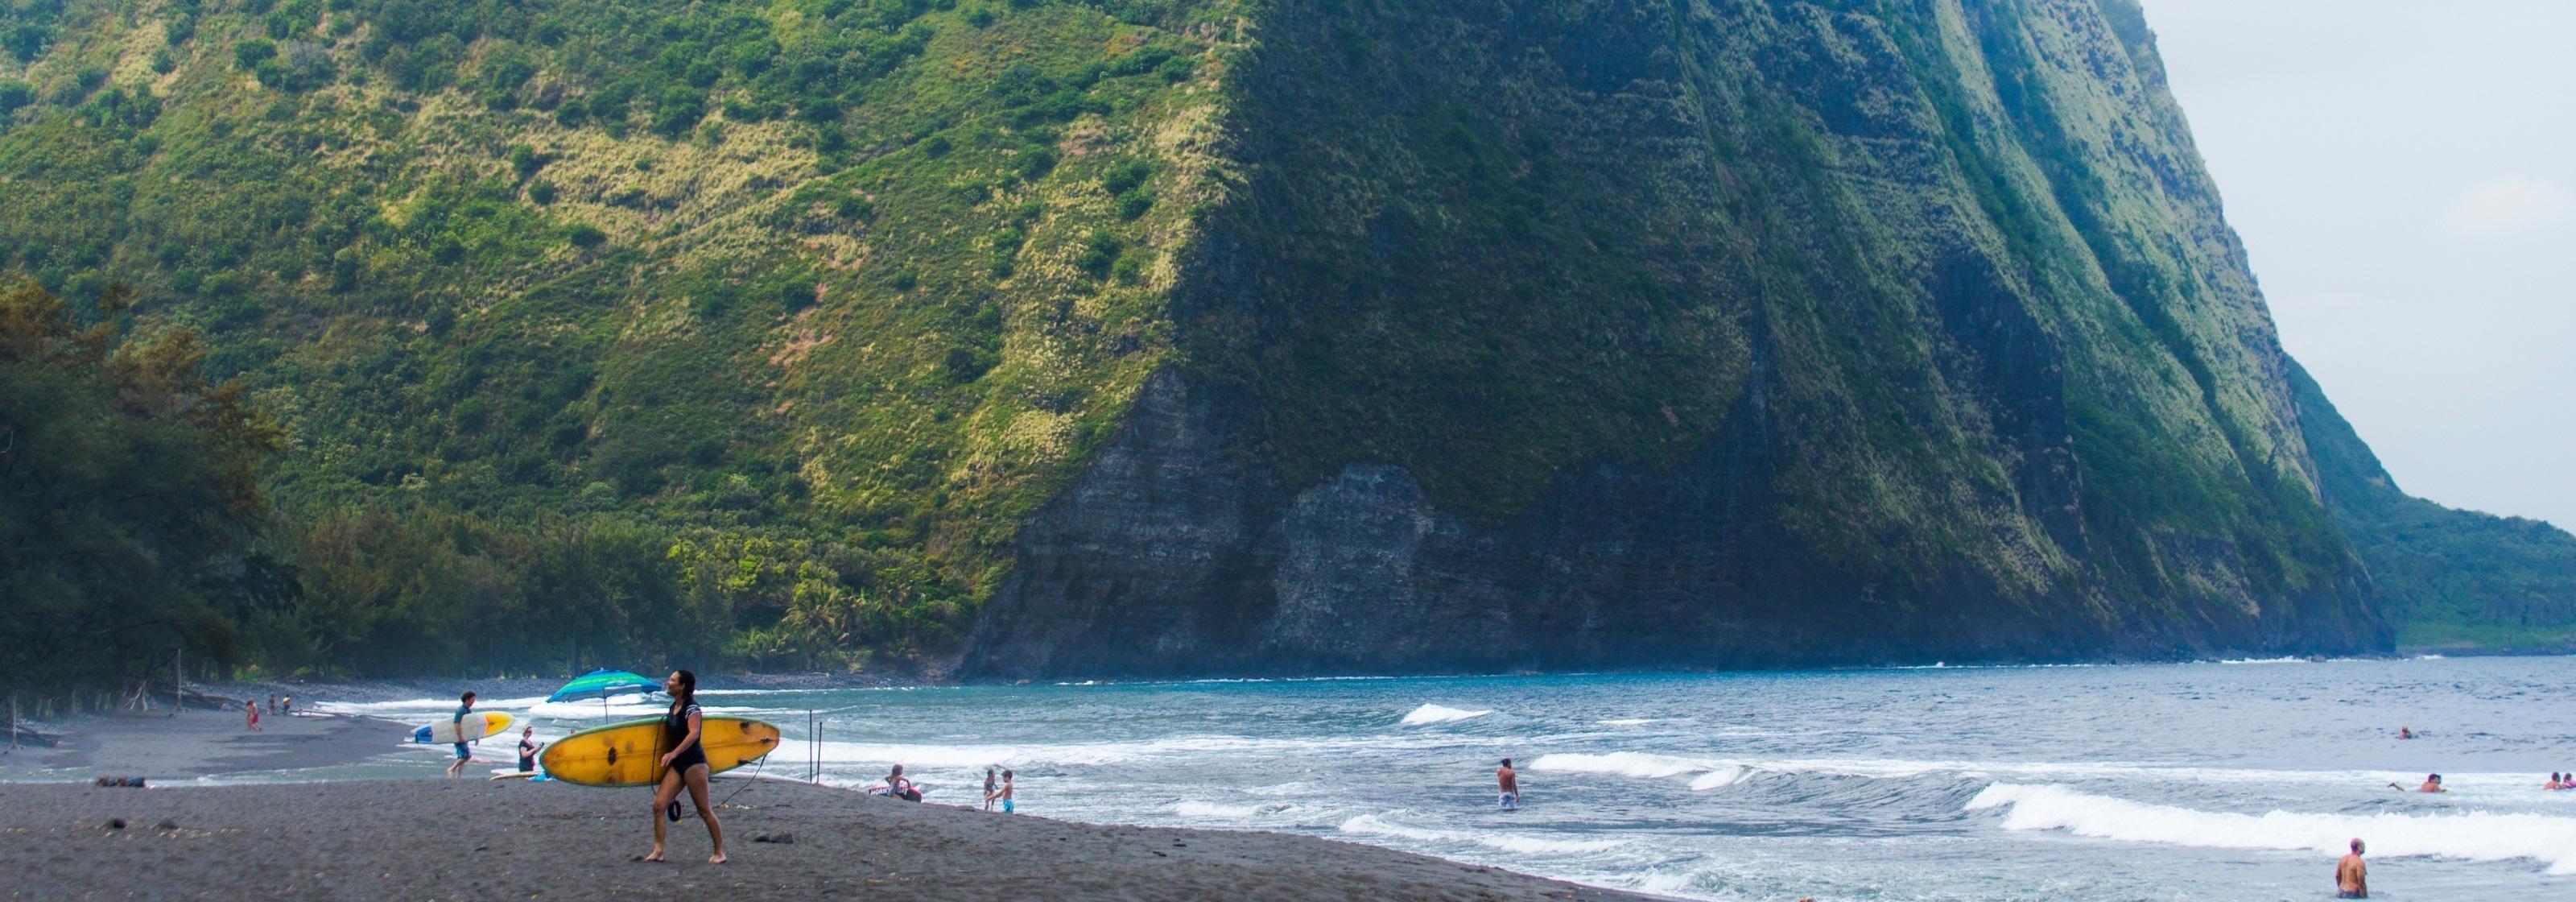 Choses à faire à Big Island (Hawaï)